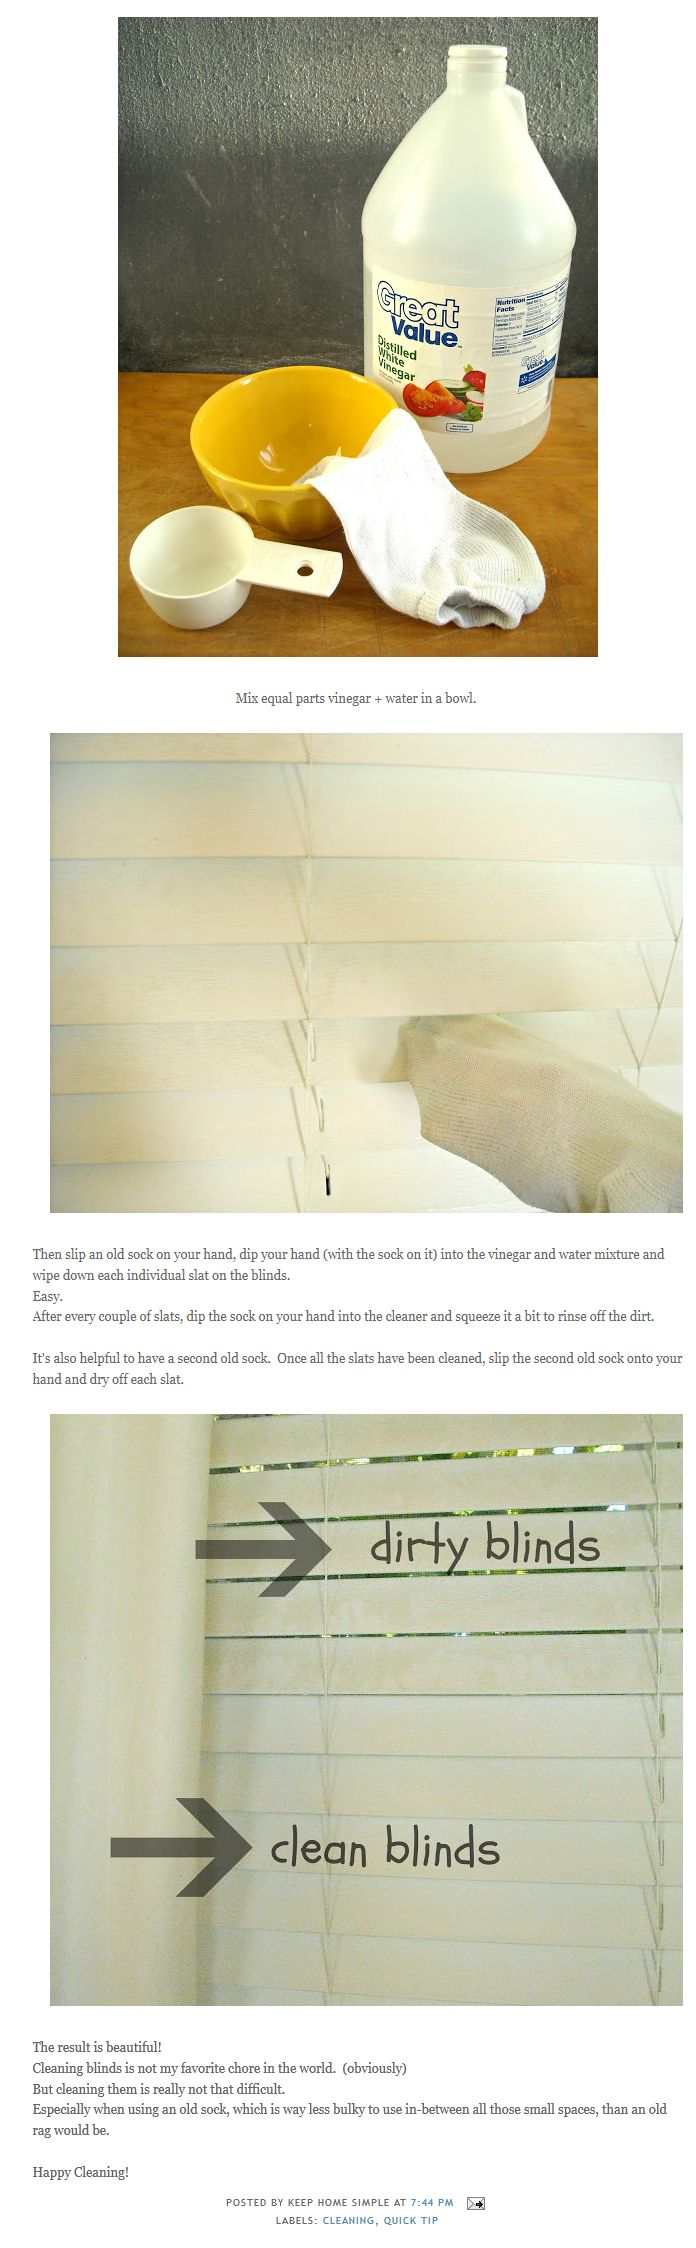 Truc super simple pour nettoyer les stores, qu'ils soient verticaux ou horizontaux.  Source: http://keephomesimple.blogspot.ca/2012/10/how-to-clean-dirty-blinds.html